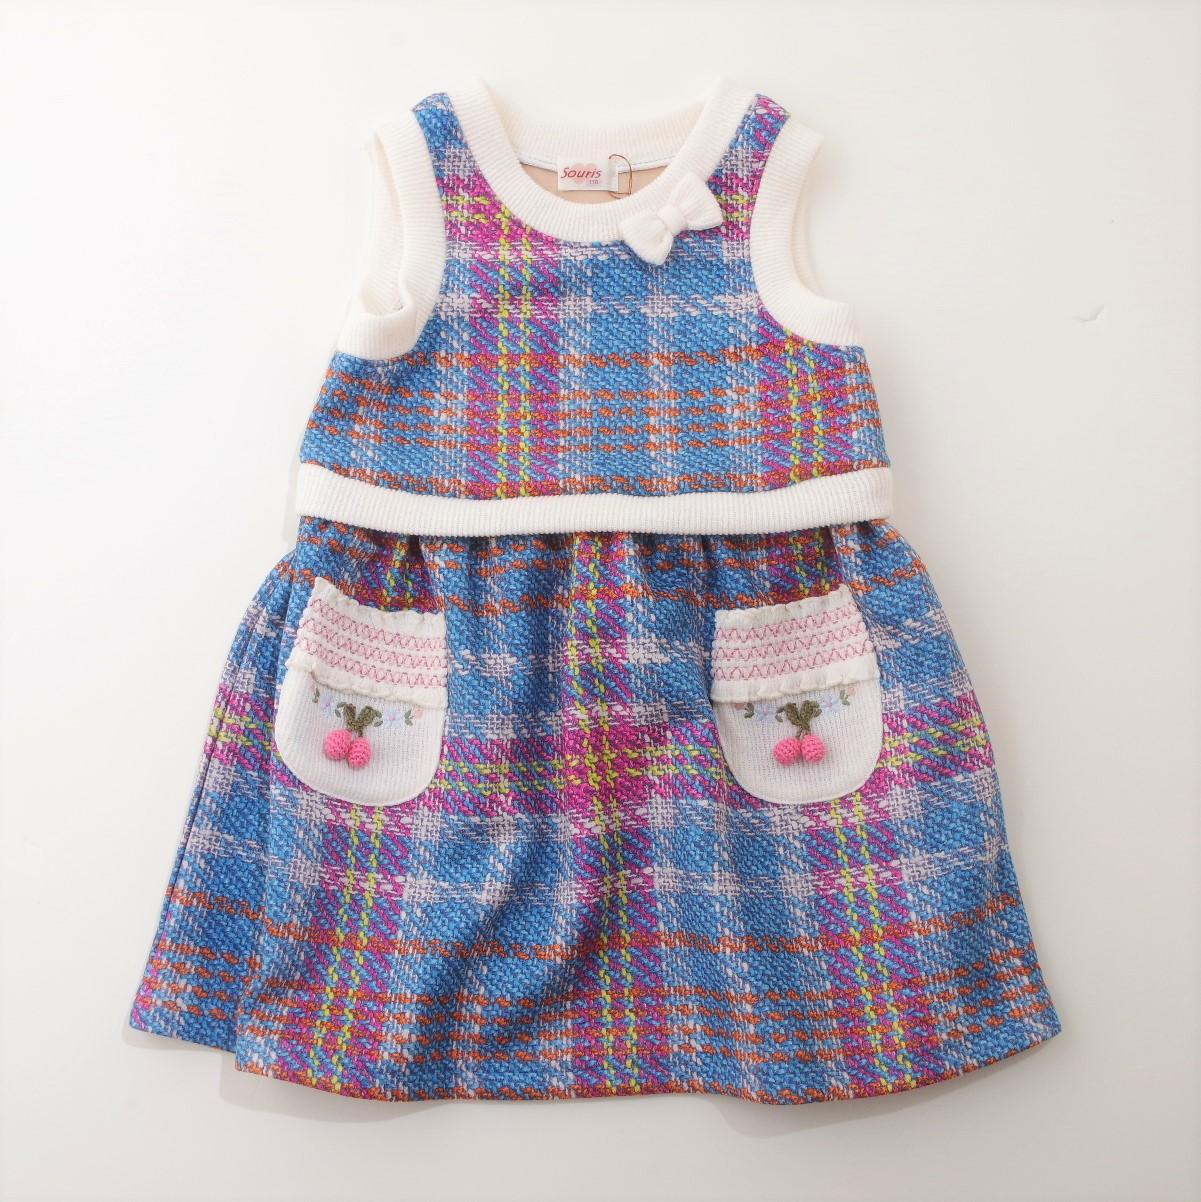 Souris(スーリー) 格子プリントジャンパースカート 90-140cm (195577-295577-BU)